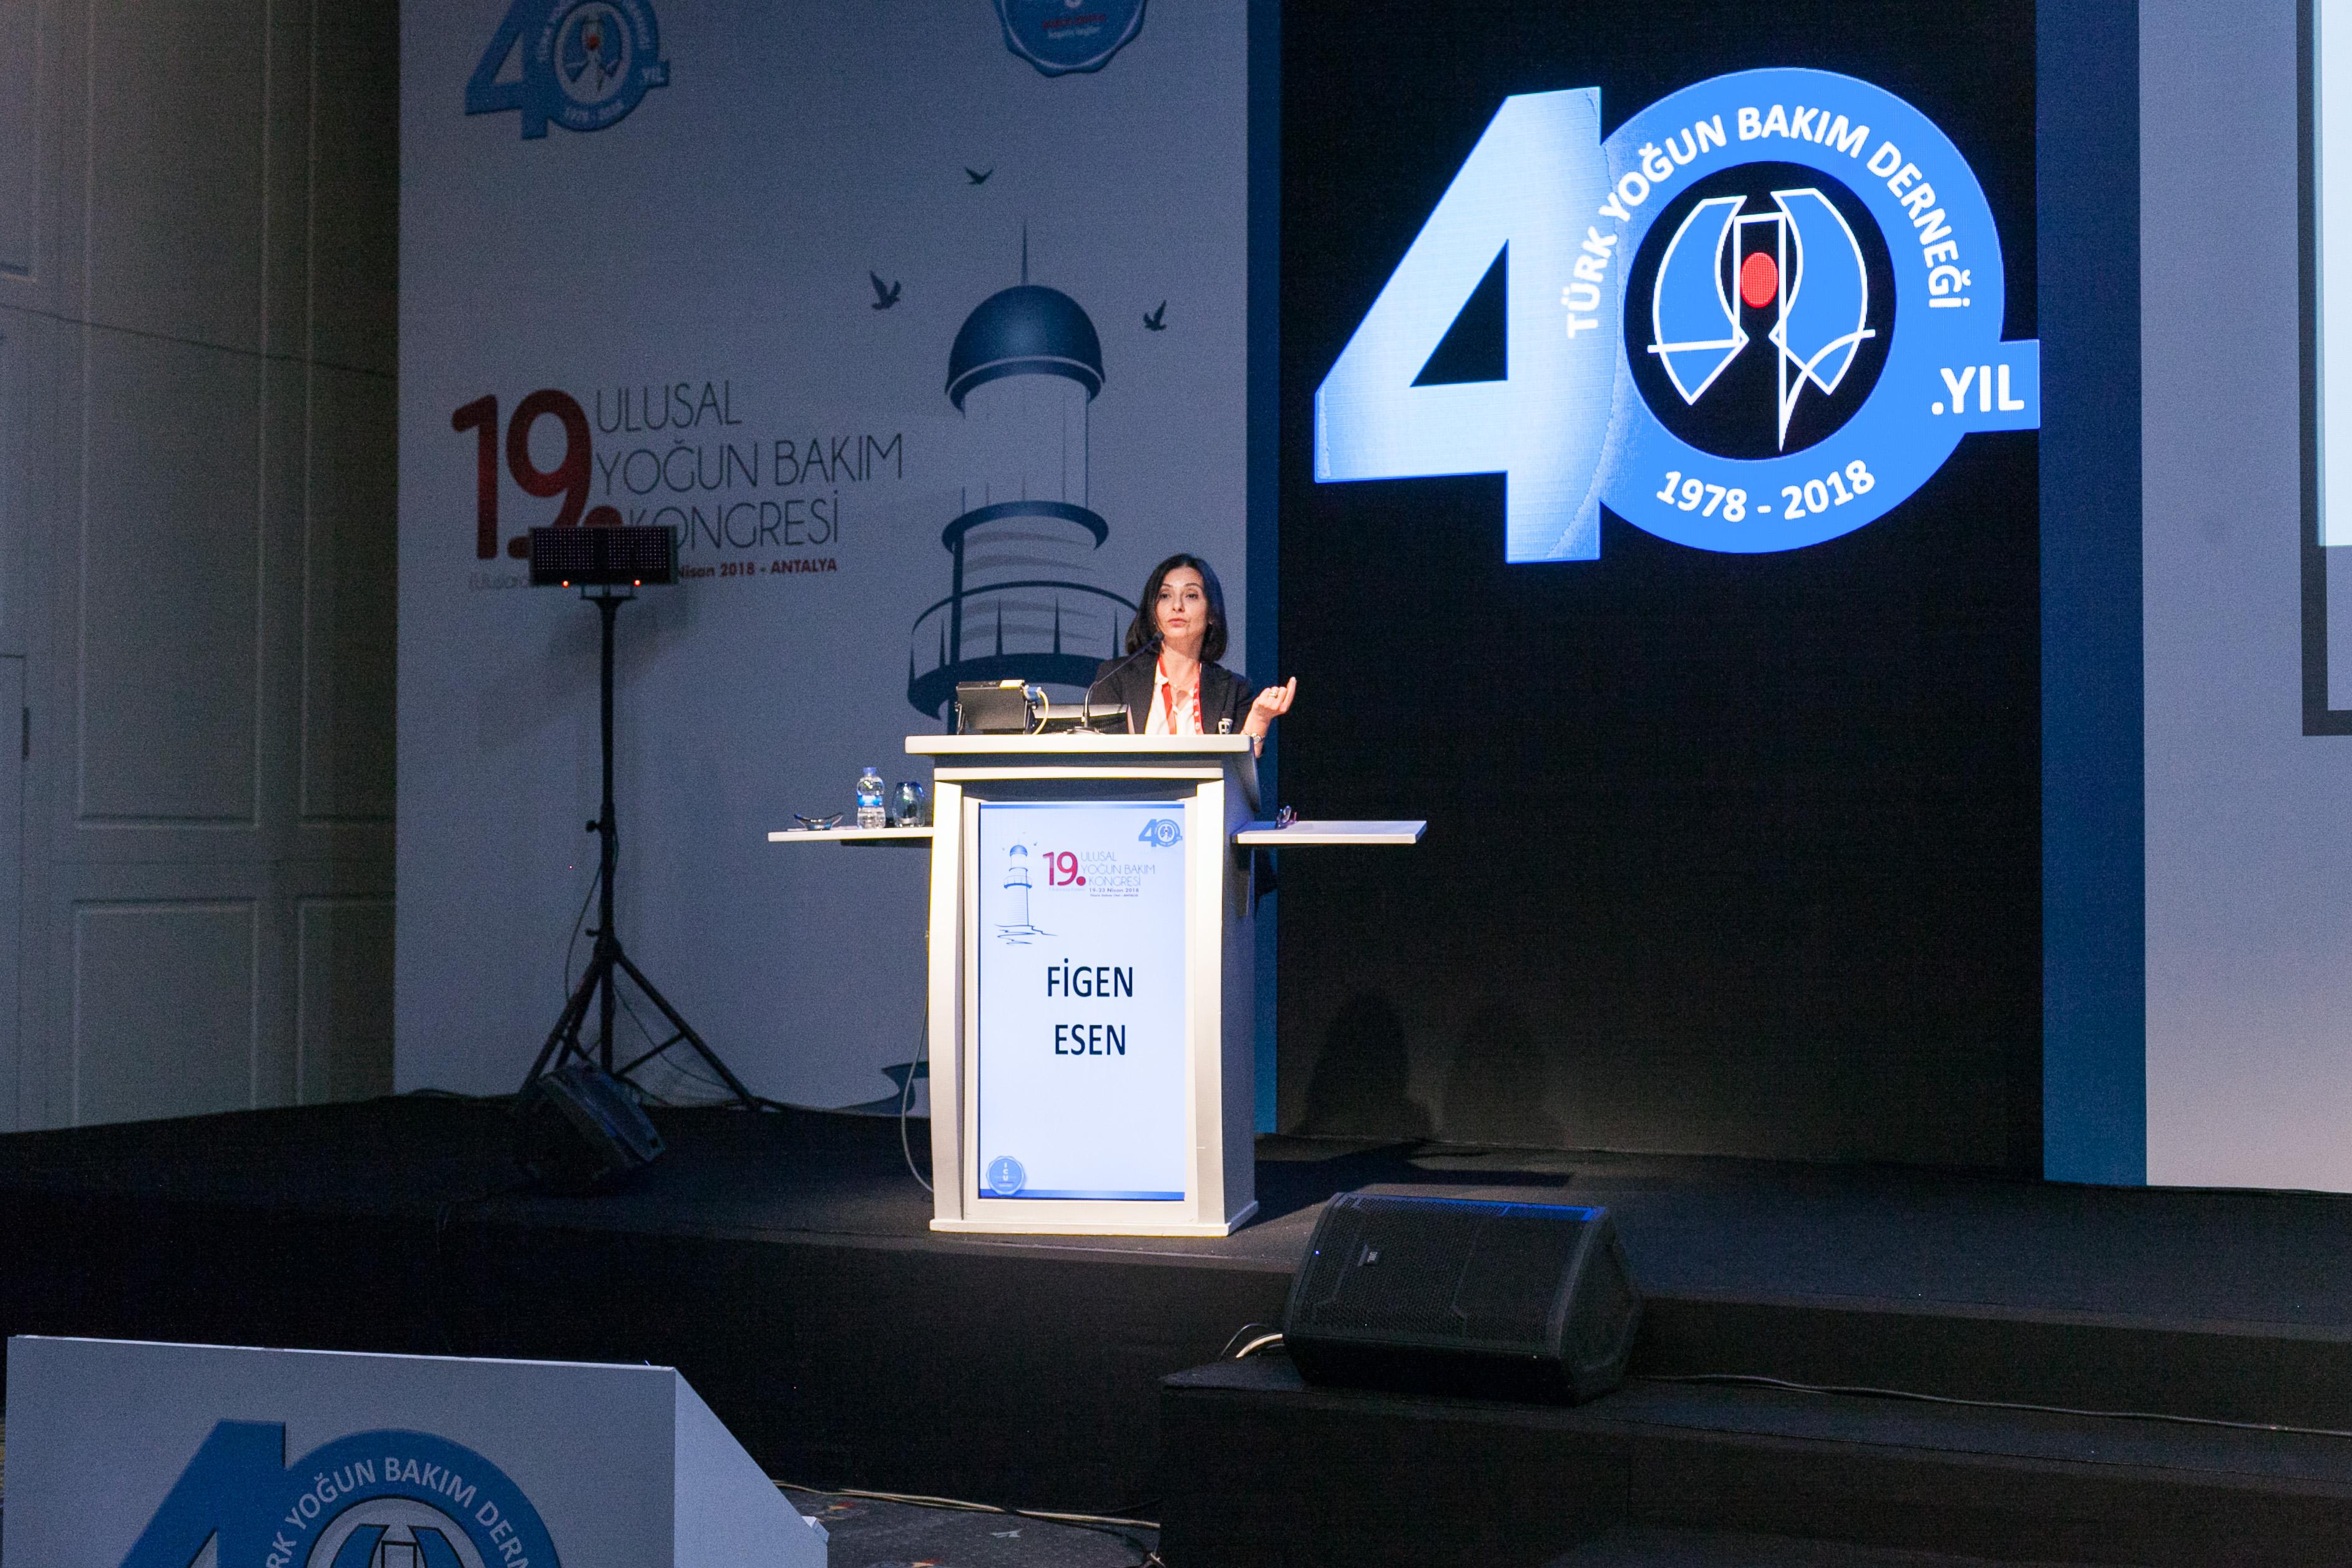 19. Ulusal Yoðun Bakým Kongresi Fotoðraflarý